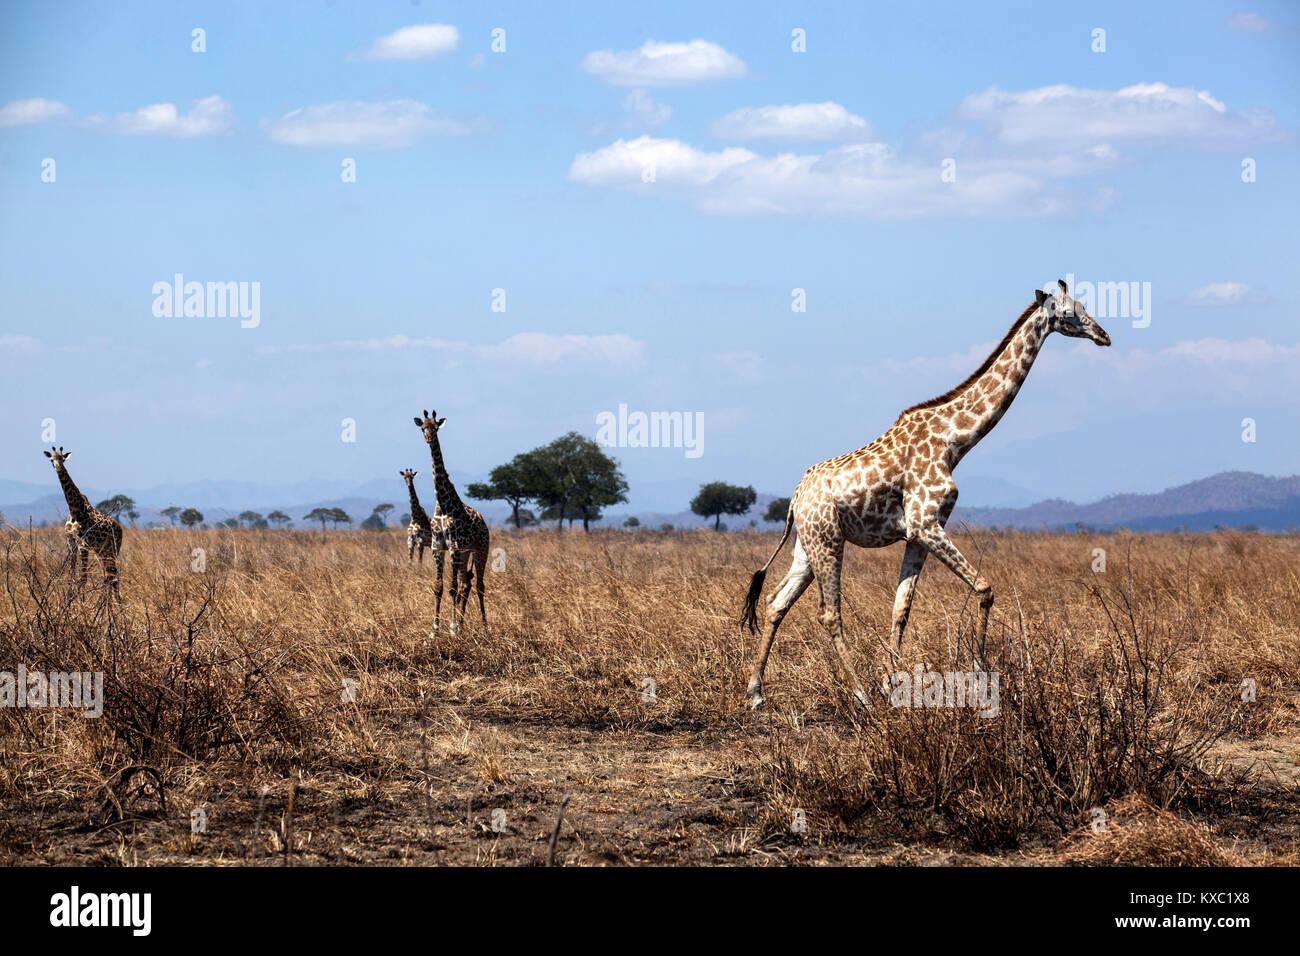 A pack of Giraffe in Mikumi National Park in Morogoro, Tanzania. - Stock Image